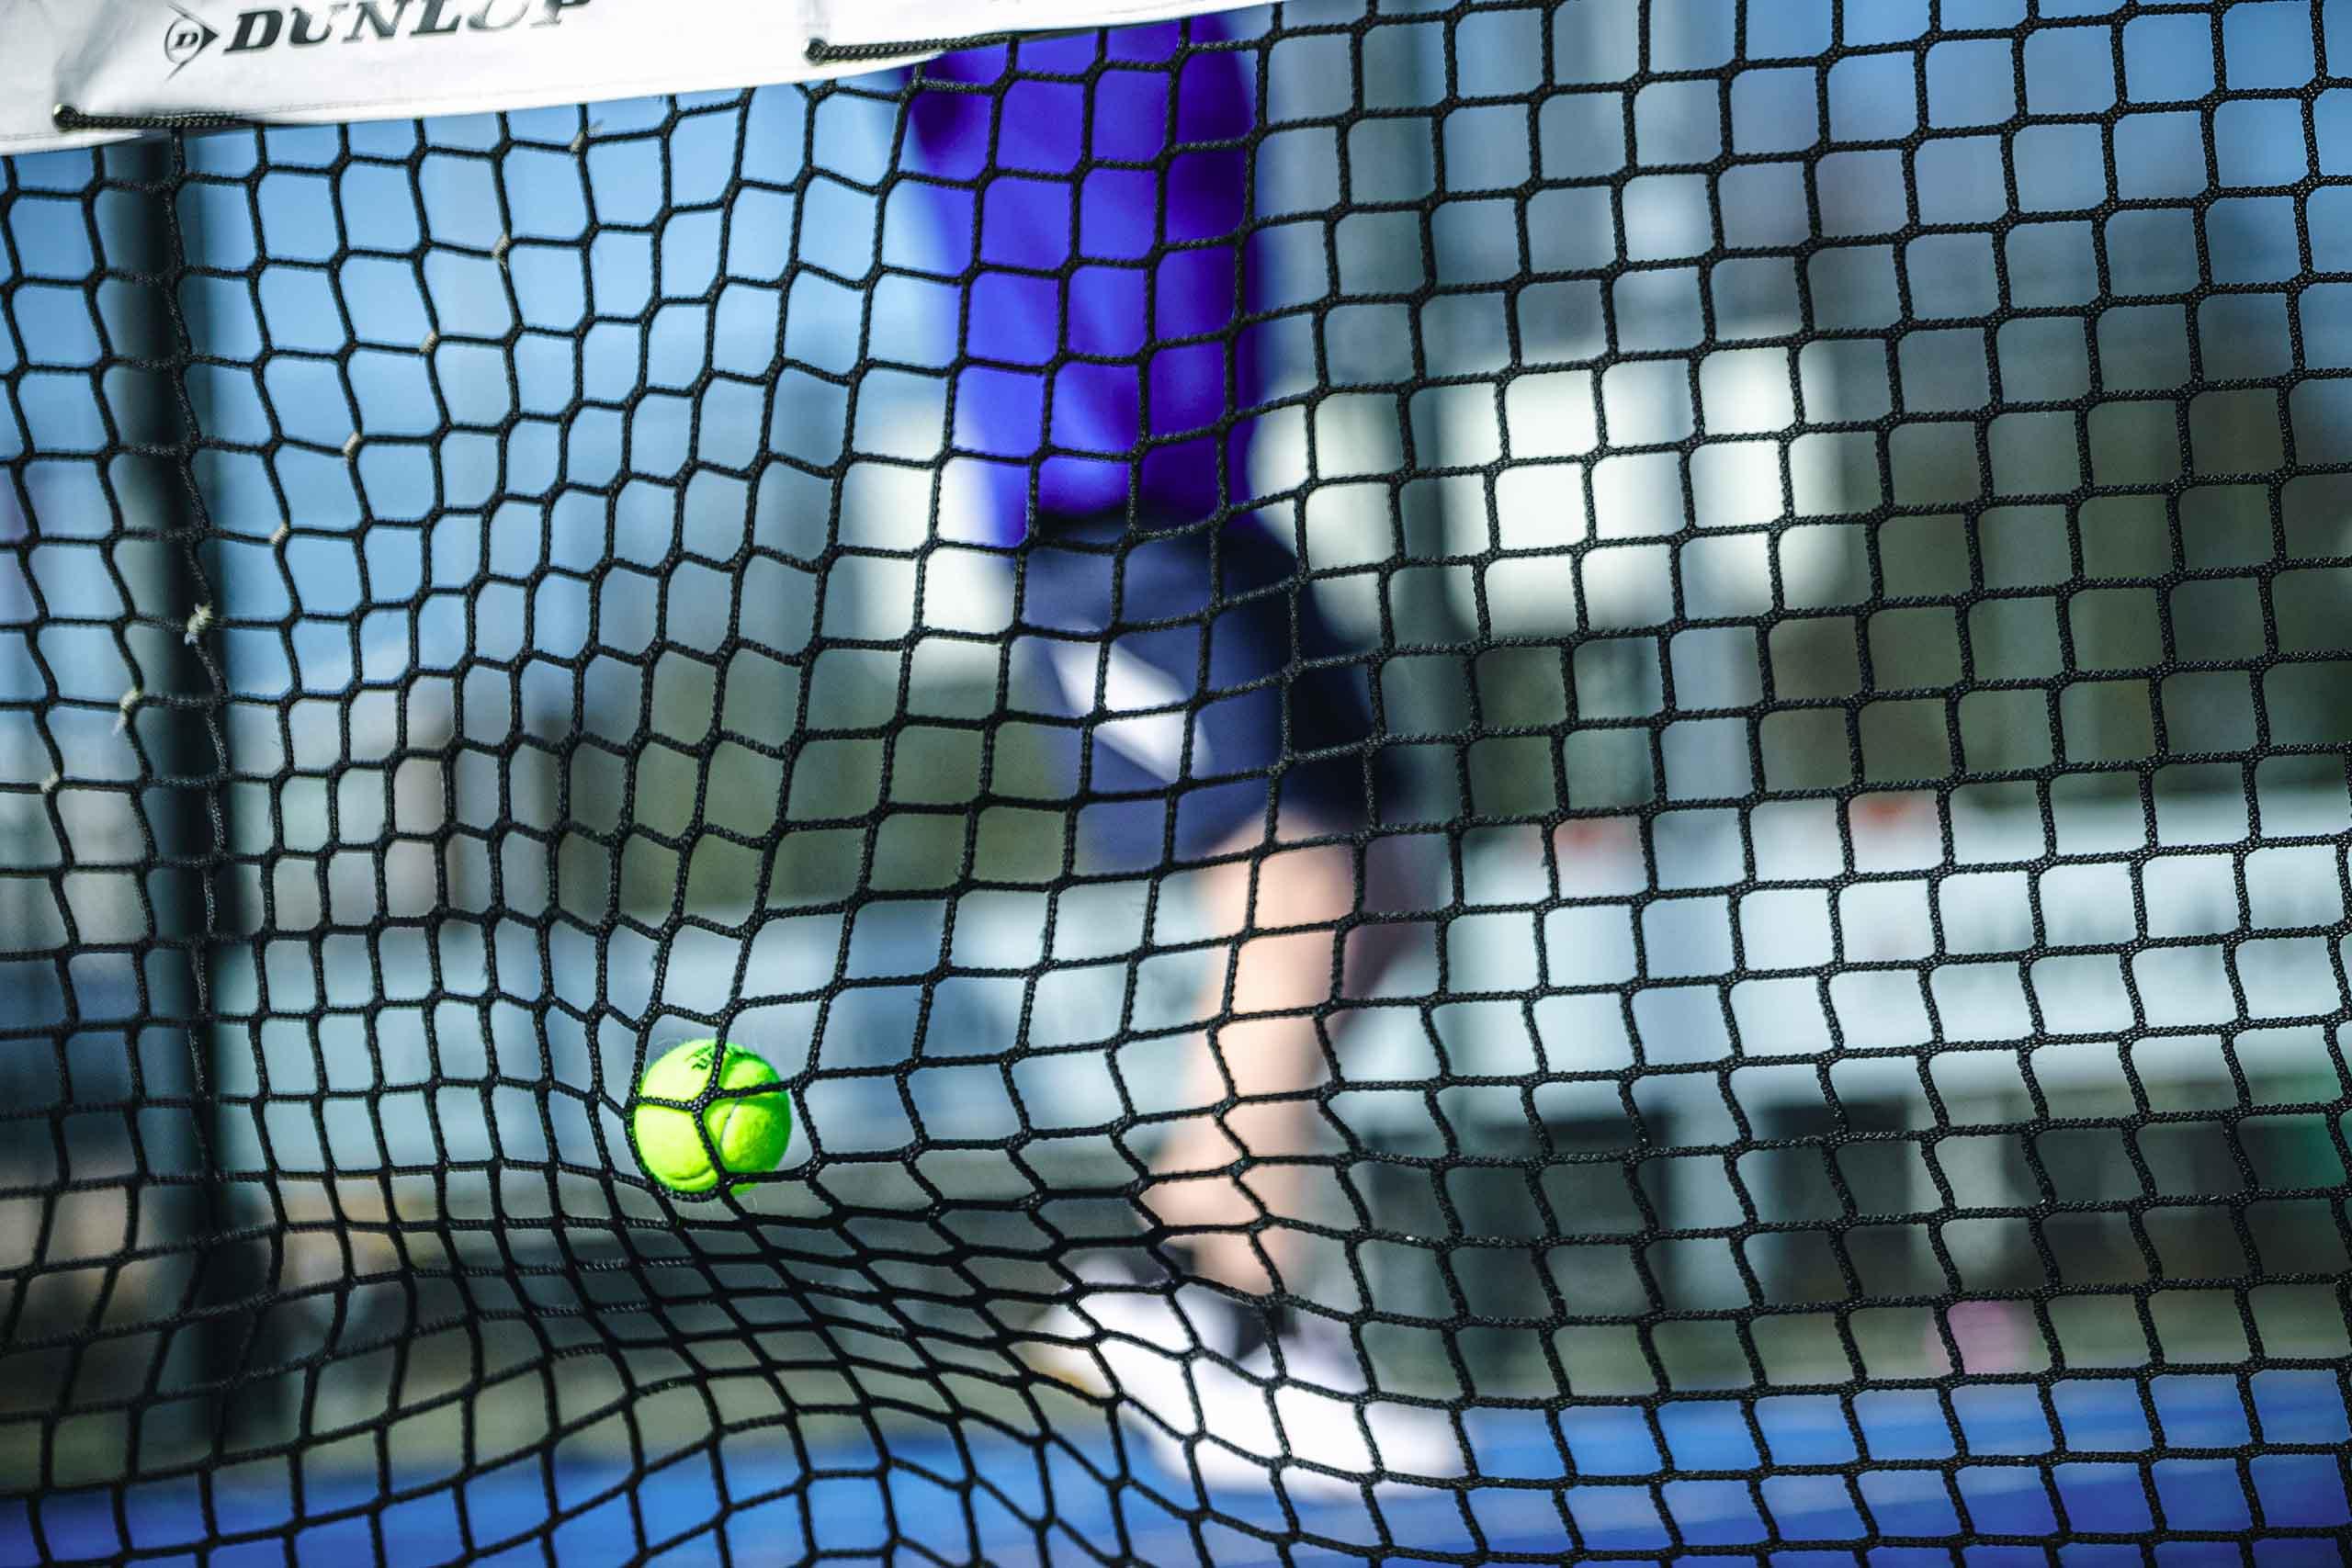 padelbal en tennisbal